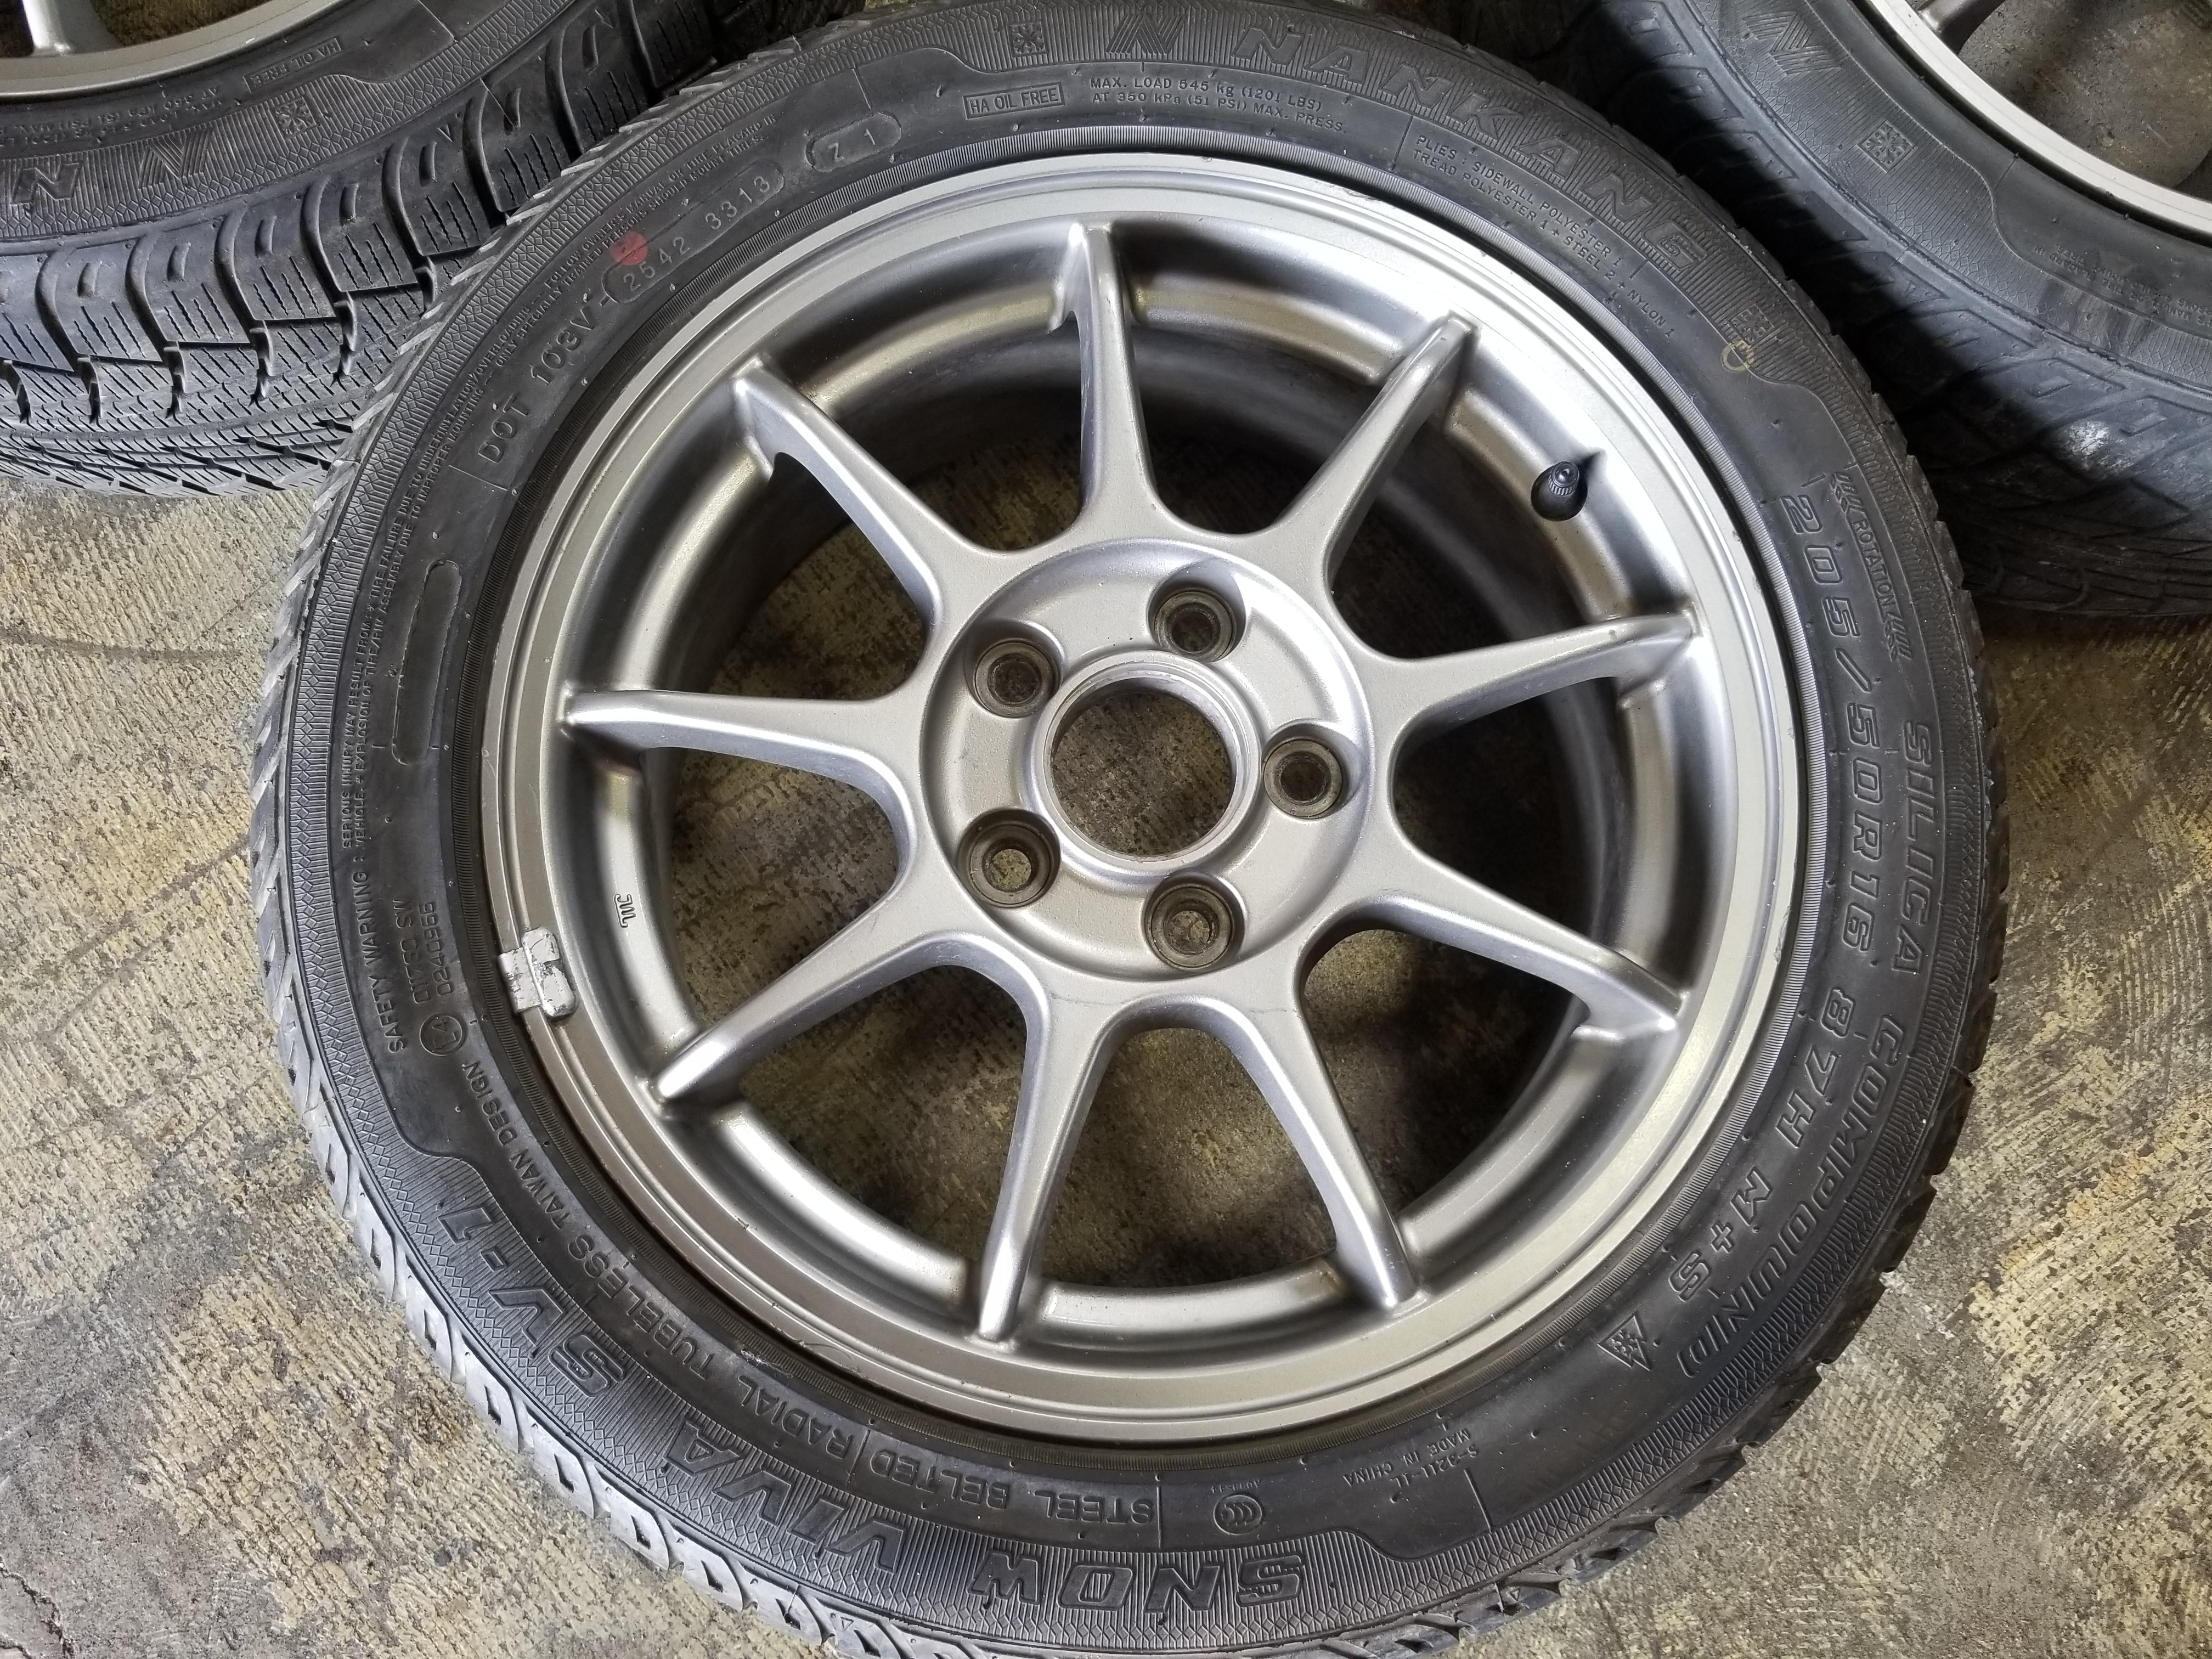 Nissan Chula Vista >> 16×6.5 +55 5×114.3 CL1 Accord Euro R Wheels 205 50 16 Nankang Snow Viva Tires #4 | JDM Of San Diego